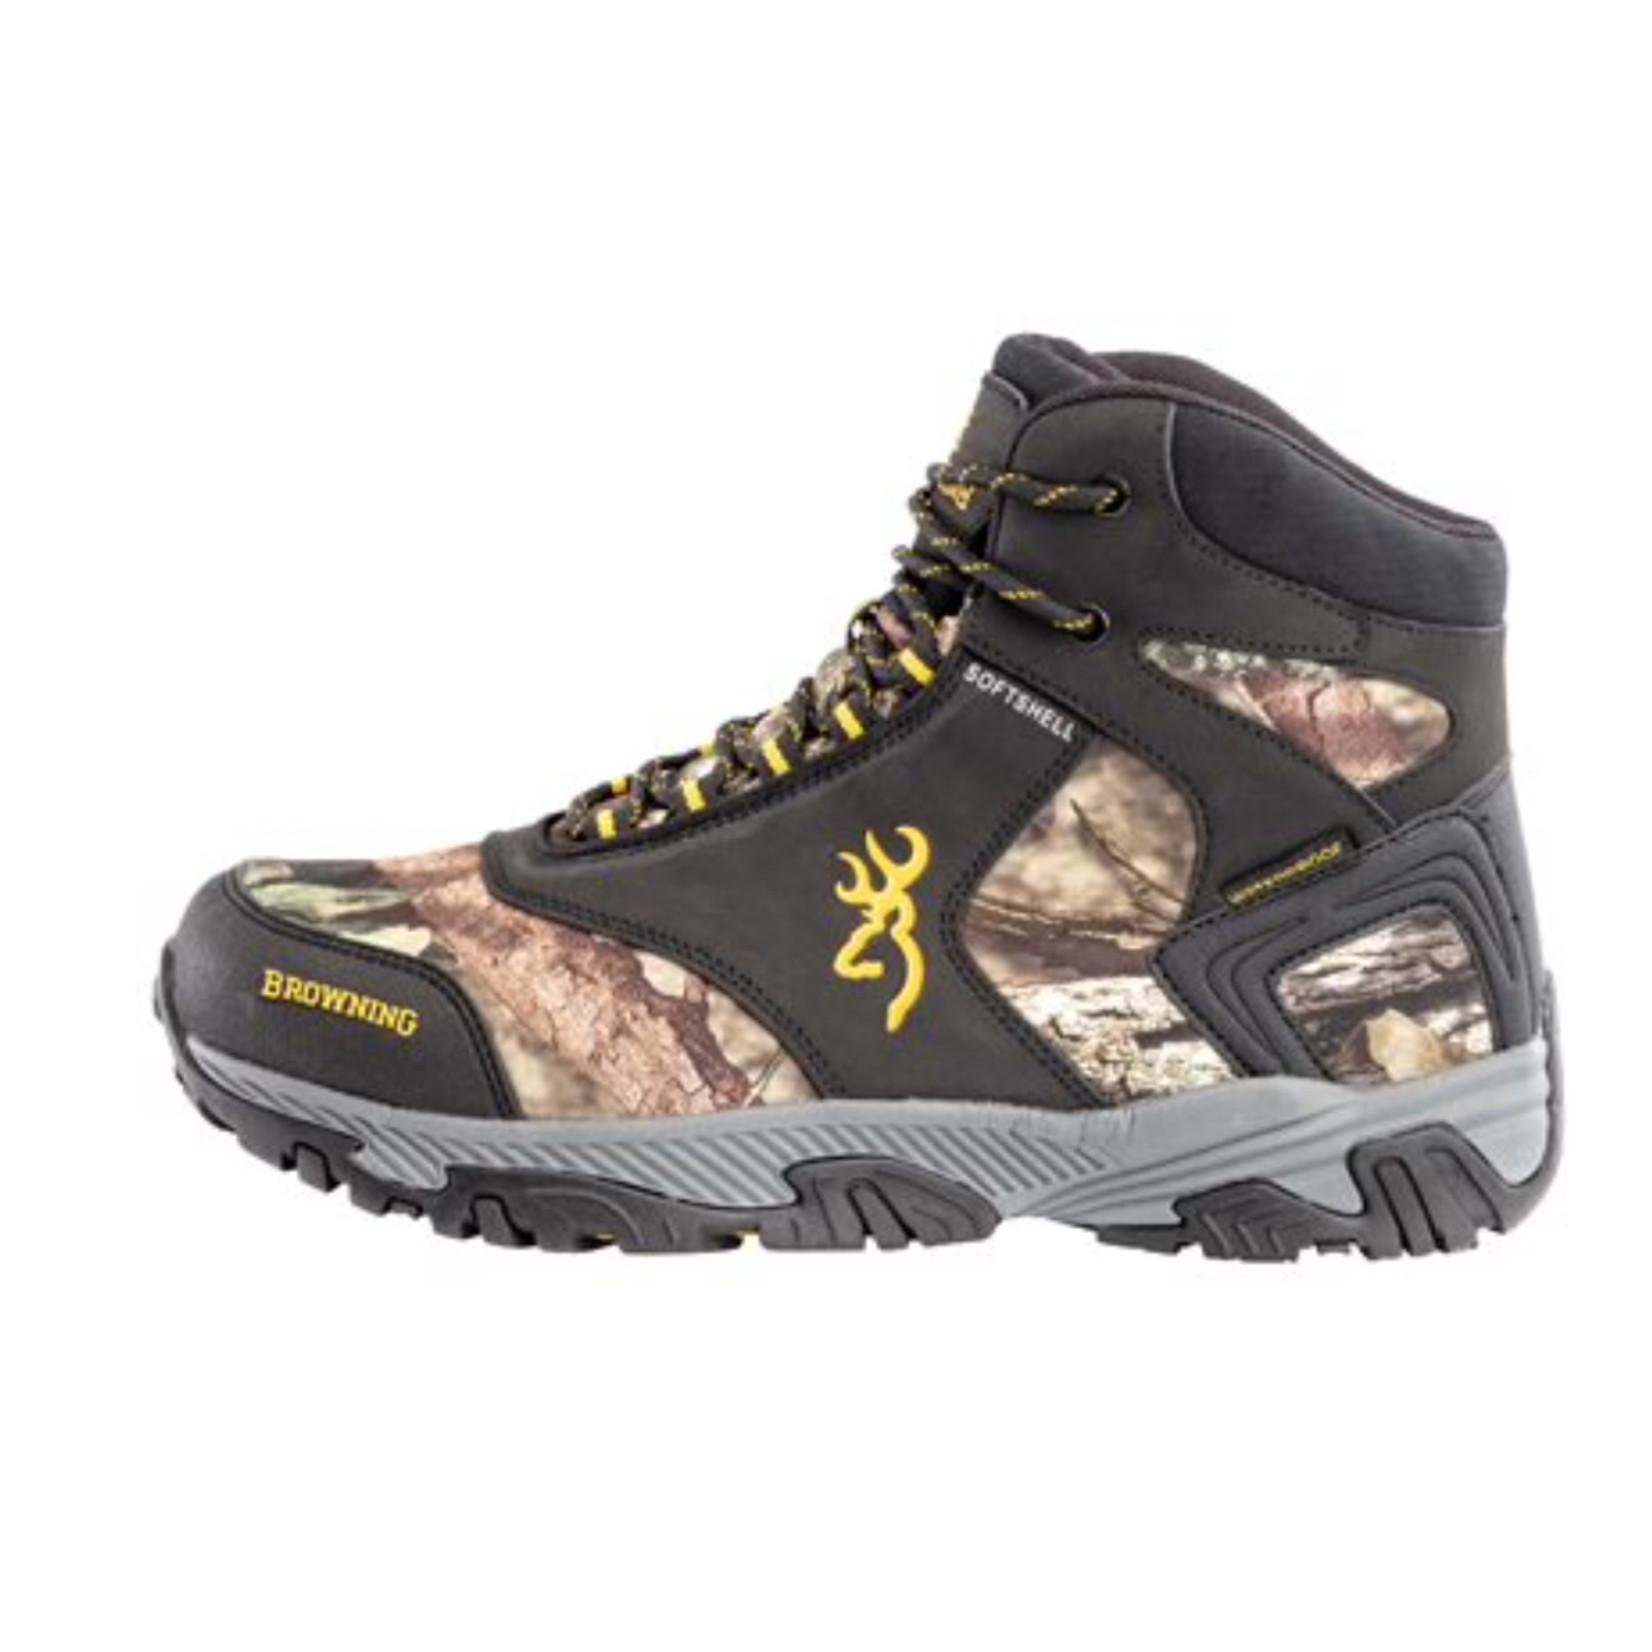 Sportchief Browning Men's Plainsman Mid Mossy Oak Waterproof Hunting Boot 538016-115